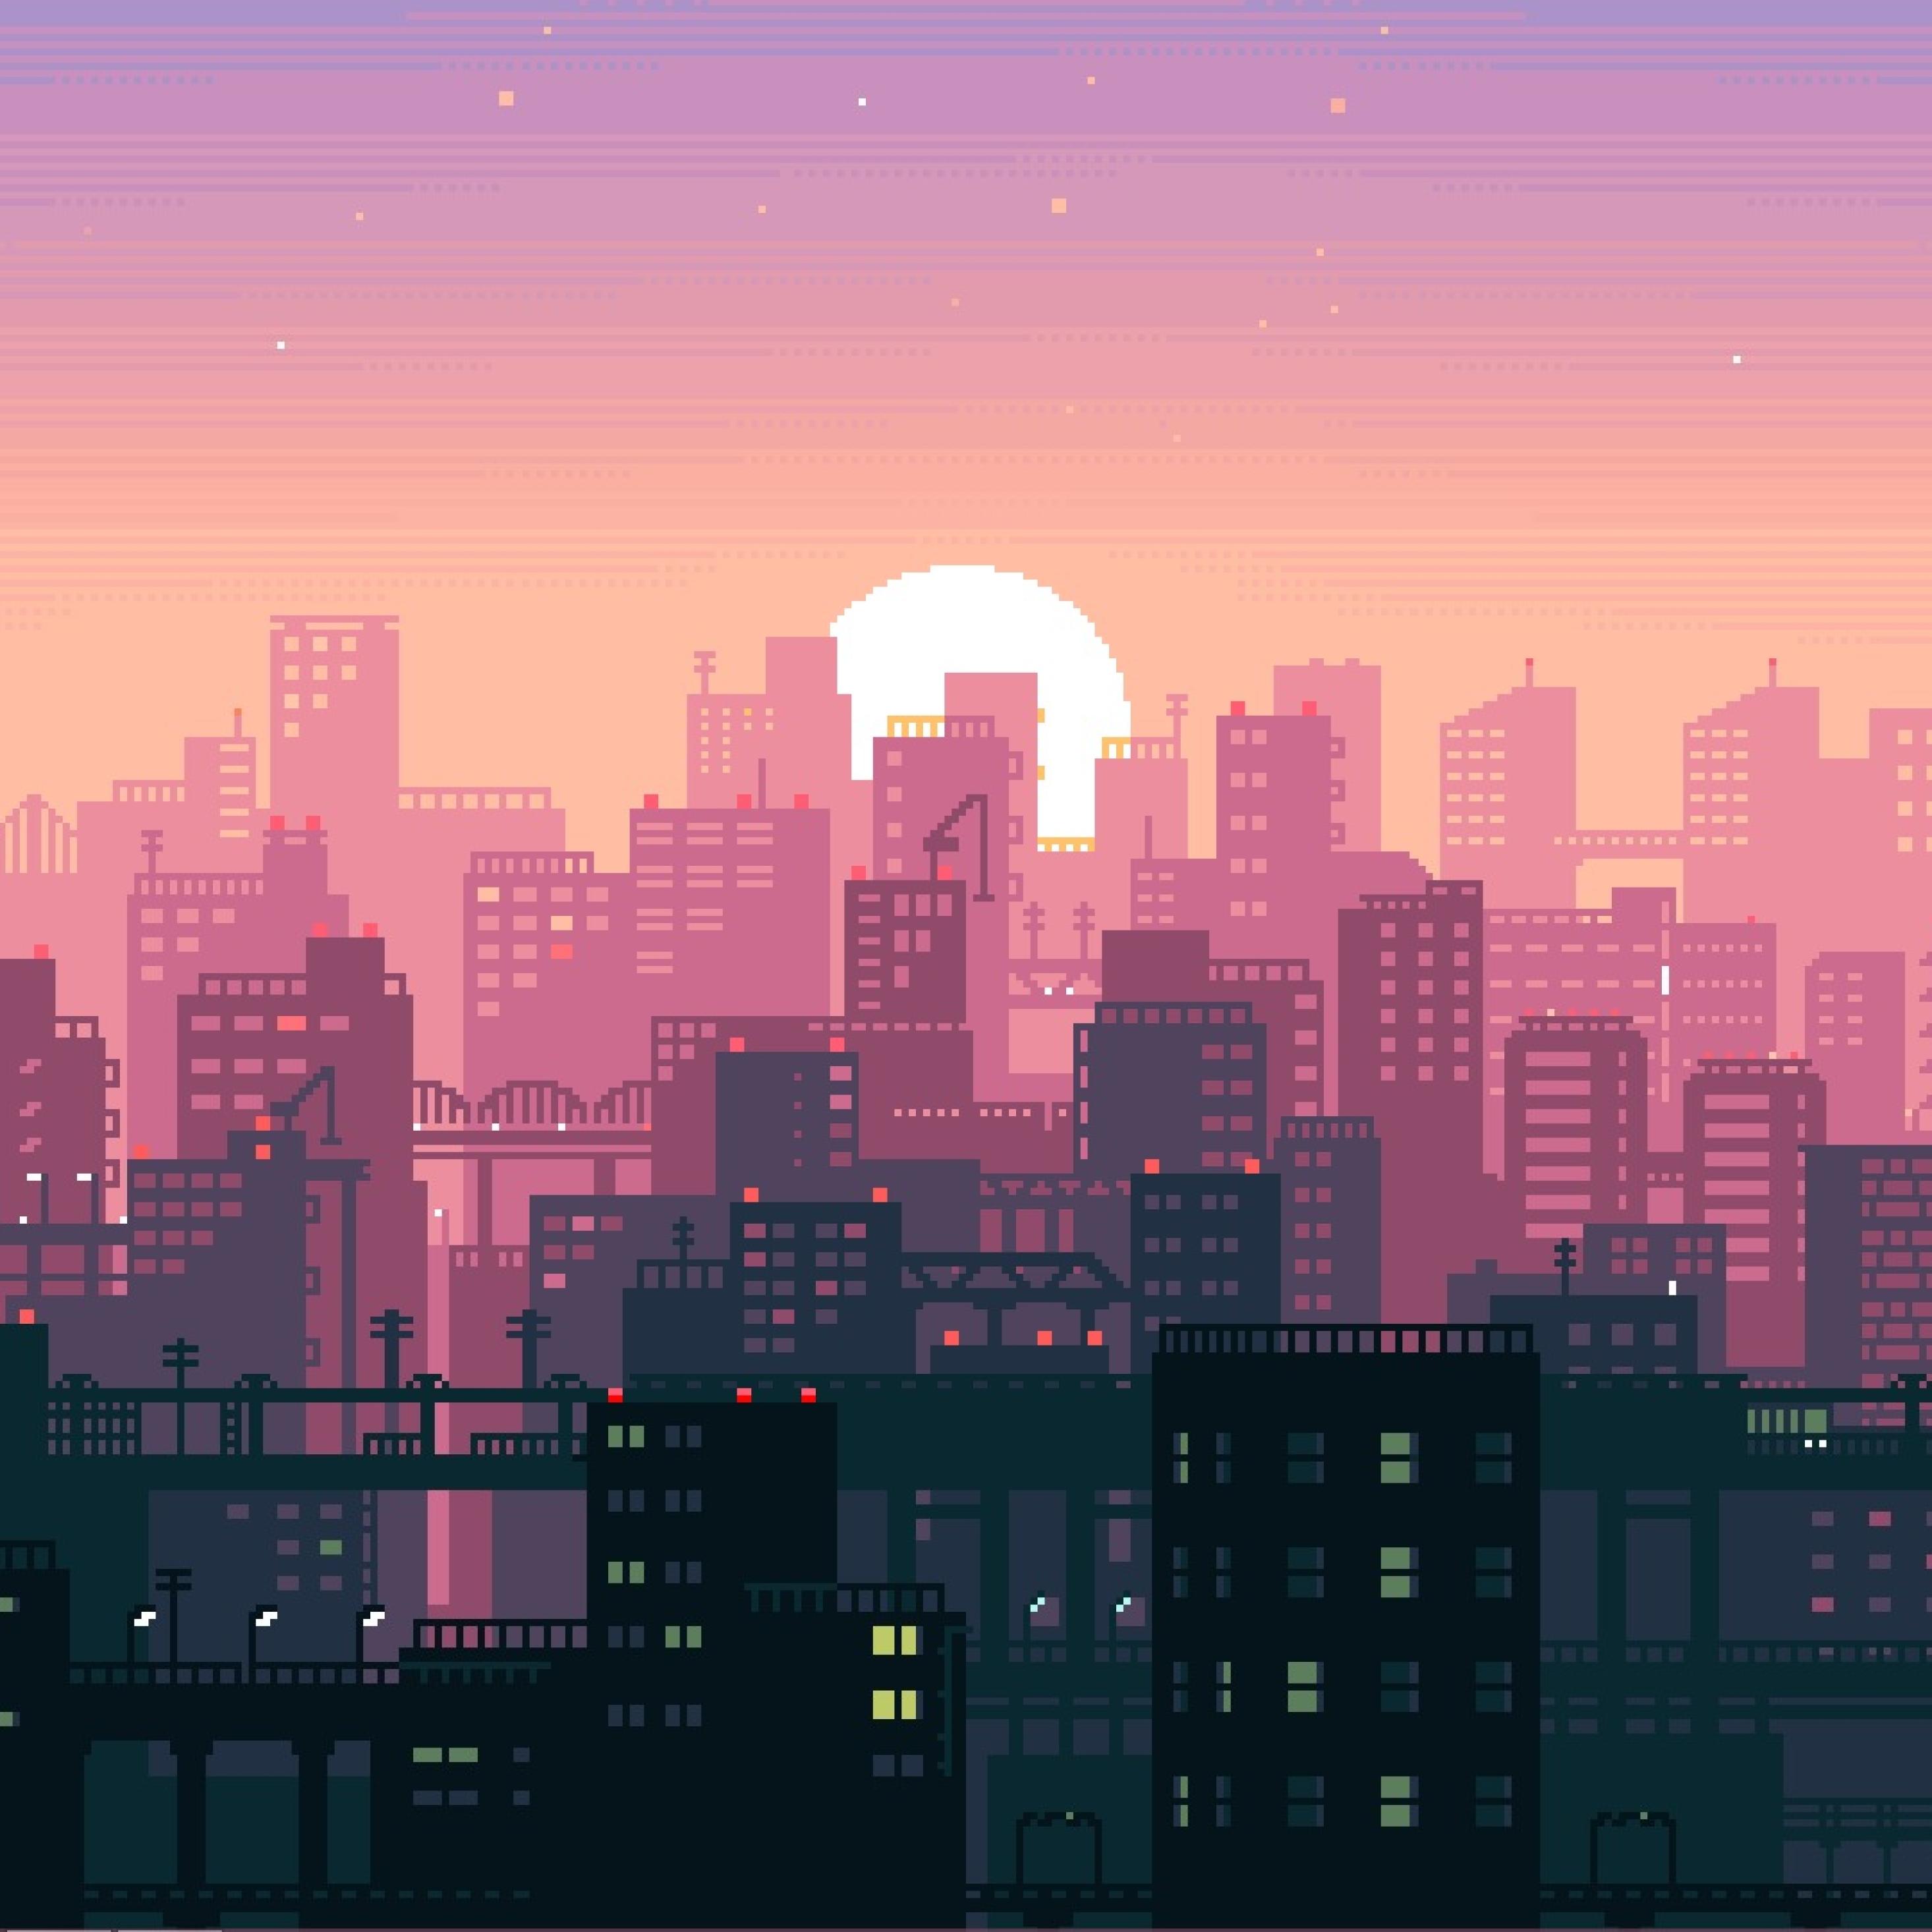 City Building Sunshine Pixel Art, Full HD Wallpaper